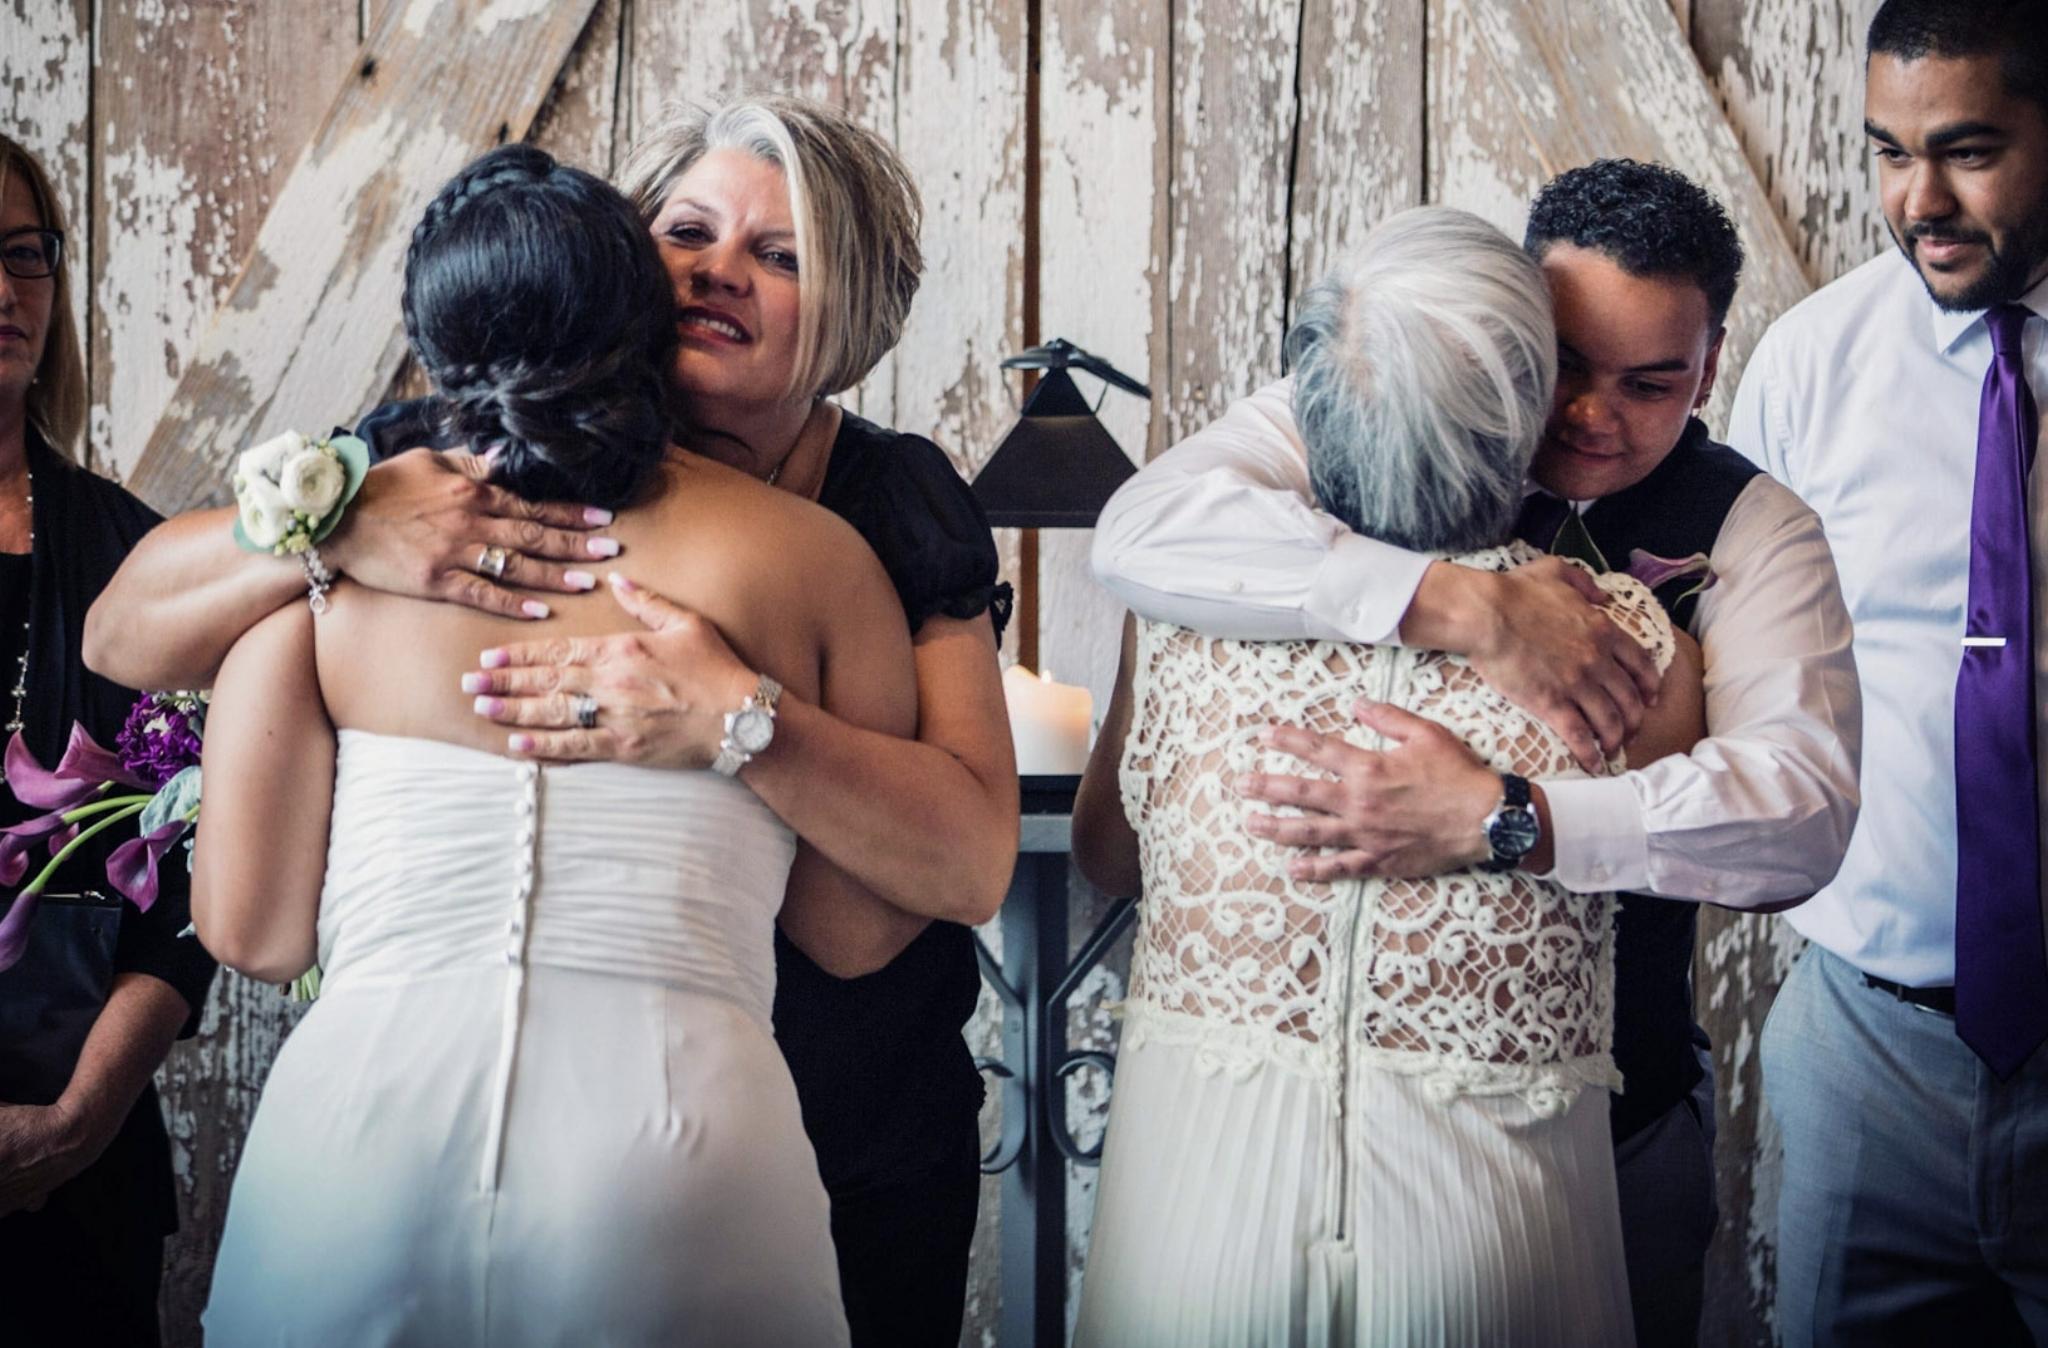 Kansas+City-Small+Wedding-Elope_Intimate_Ceremony_Mother's+Day_4.jpg